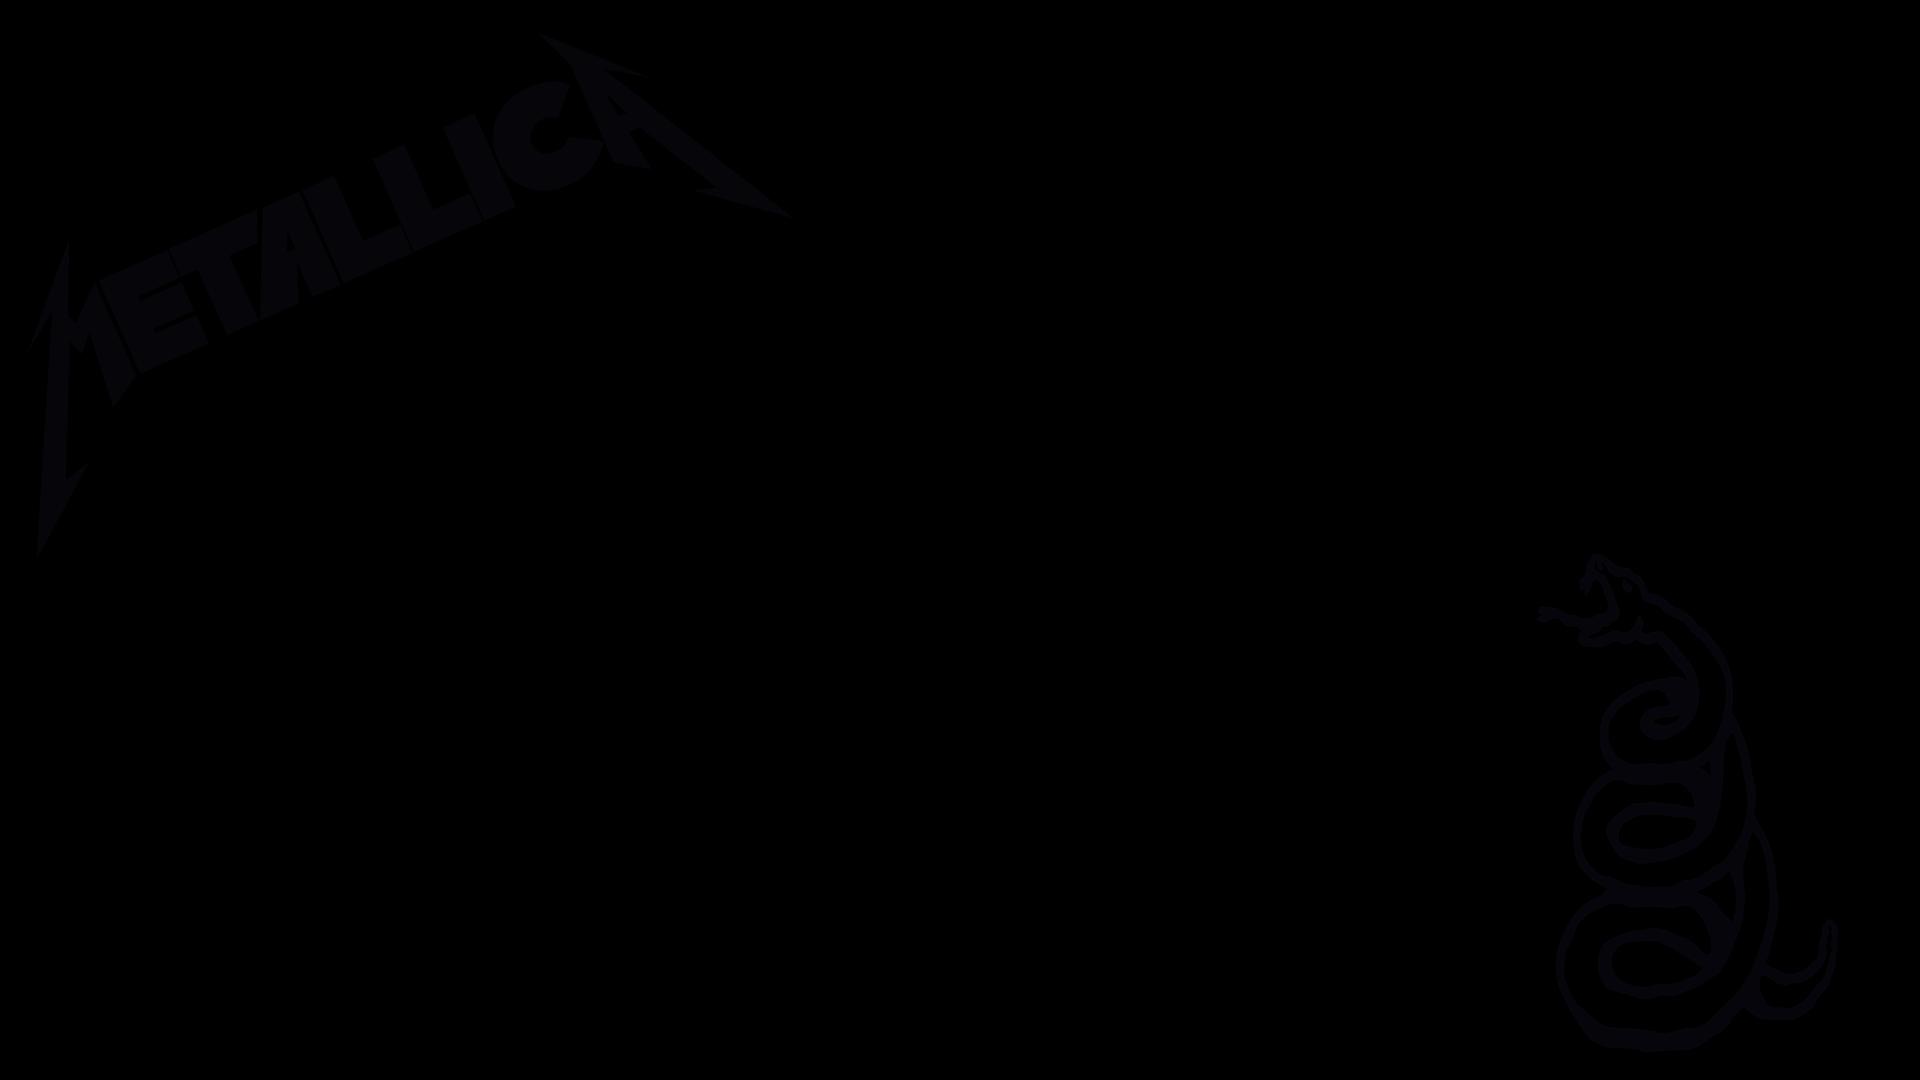 Metallica The Black Album Wallpapers Wallpaper Cave